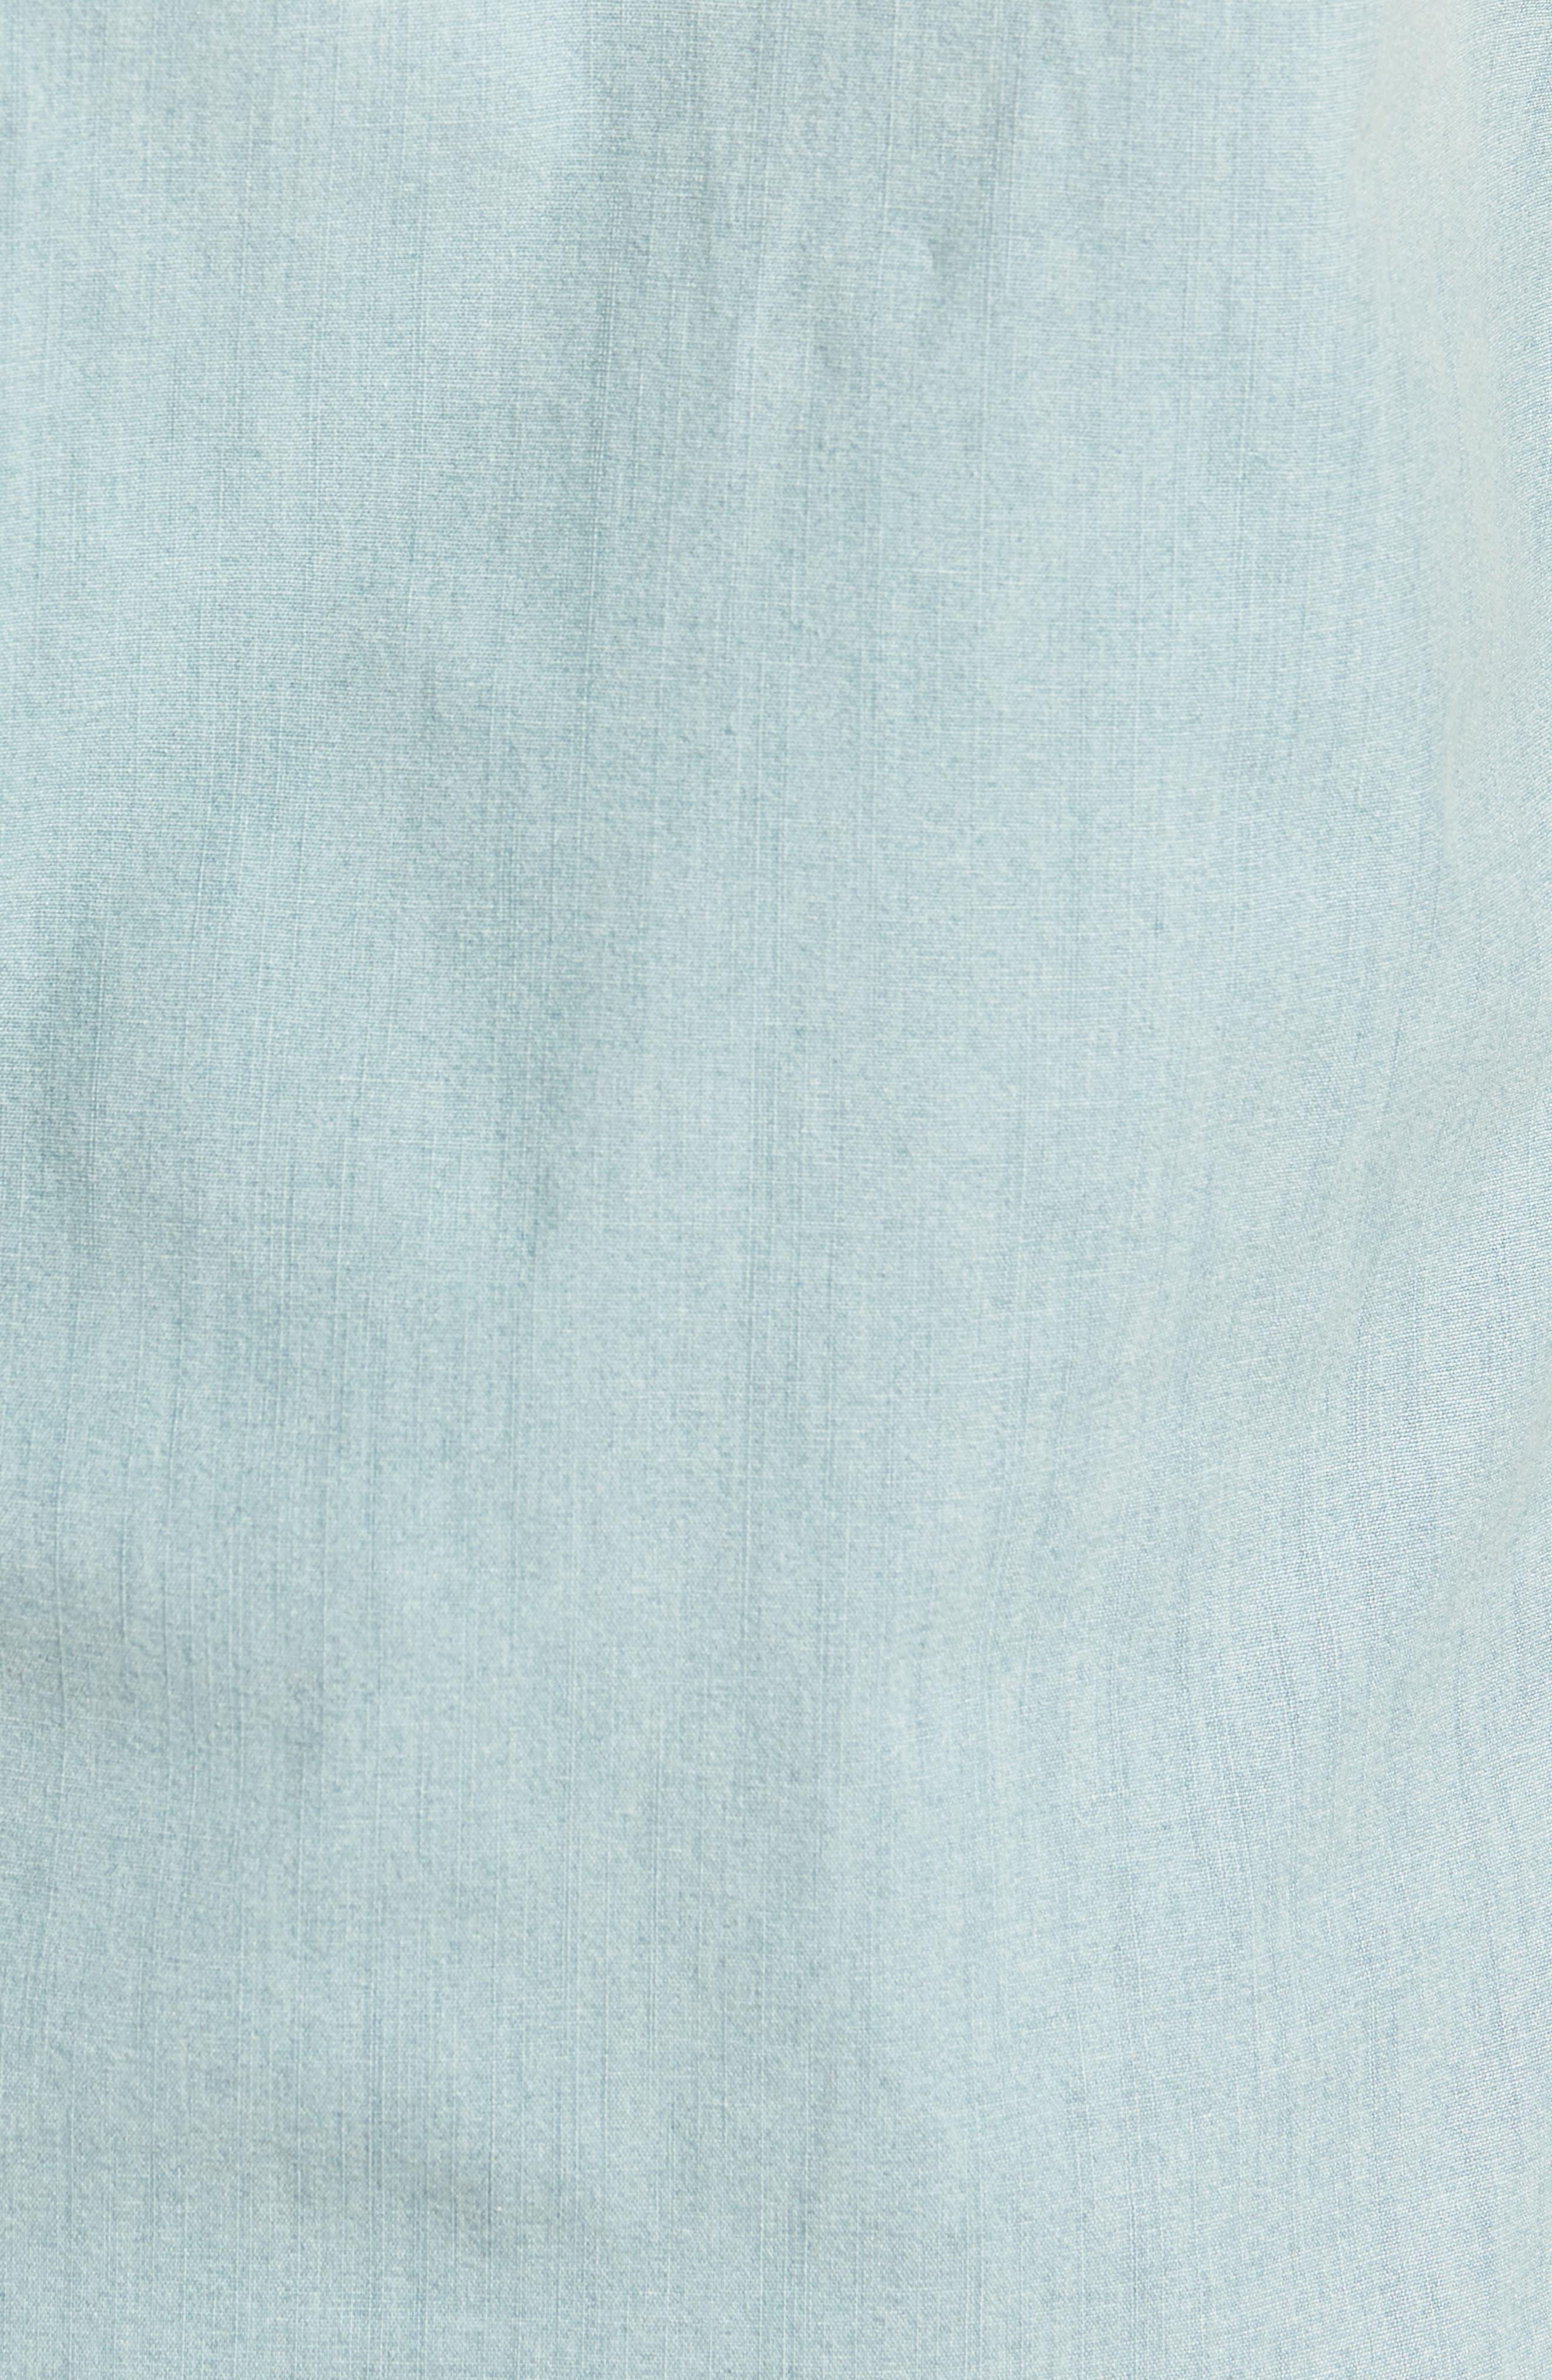 Slim Fit Stretch Chambray Shirt,                             Alternate thumbnail 5, color,                             Indigo